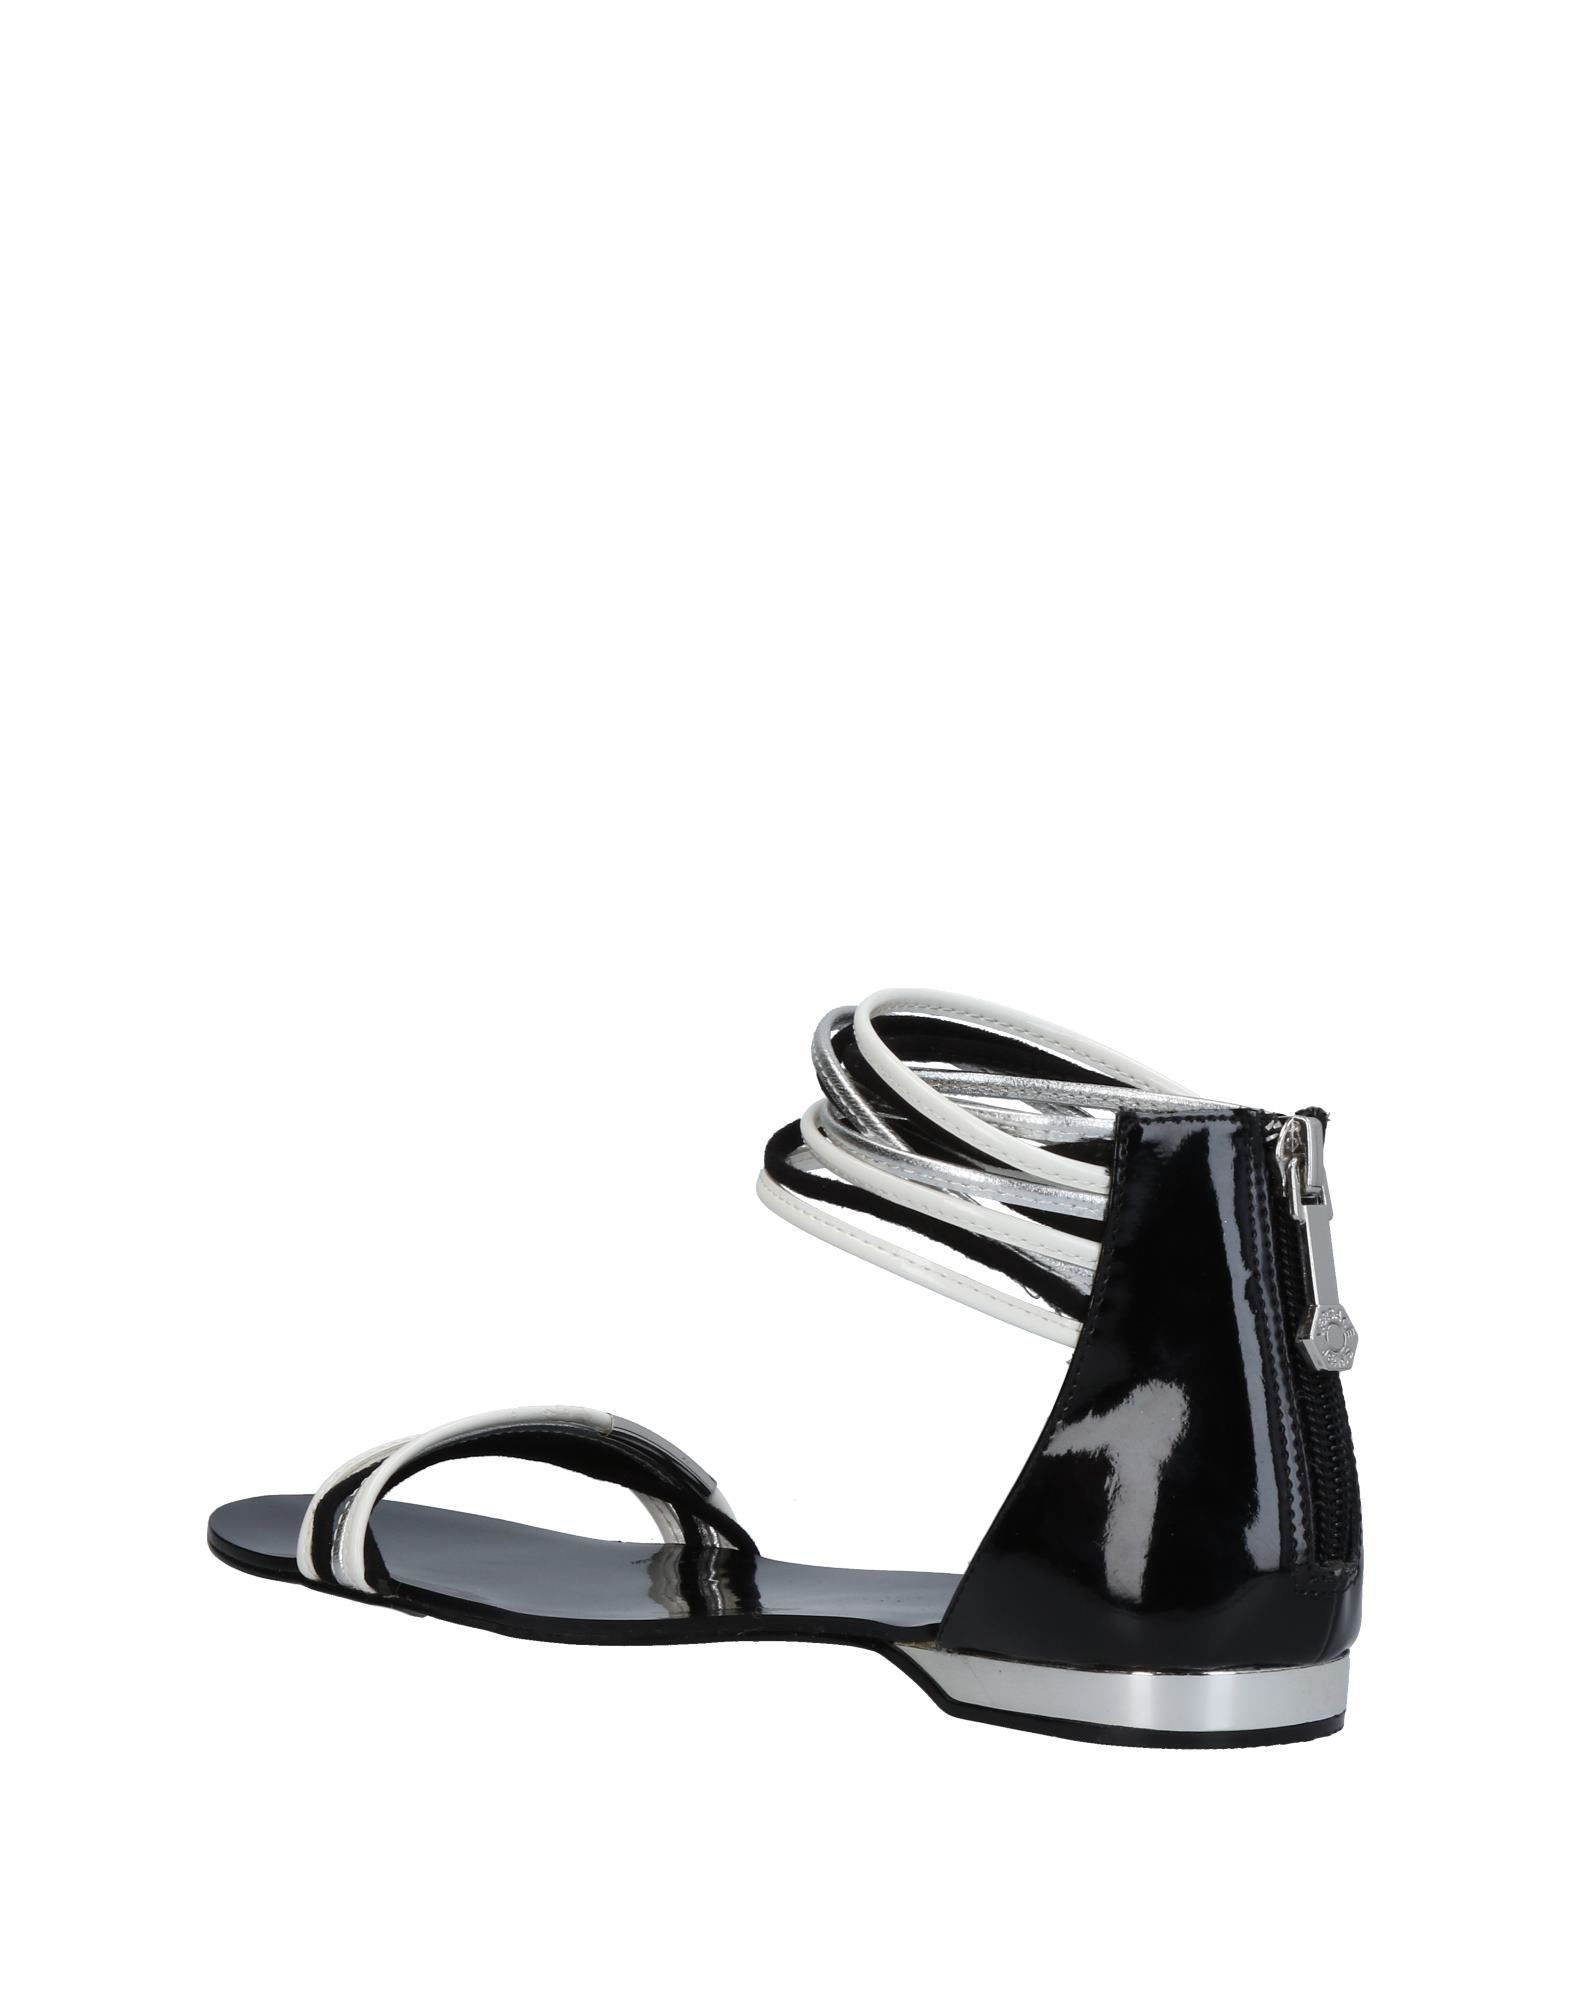 Stilvolle Sandalen billige Schuhe Versace Jeans Sandalen Stilvolle Damen  11453391PS 69648d